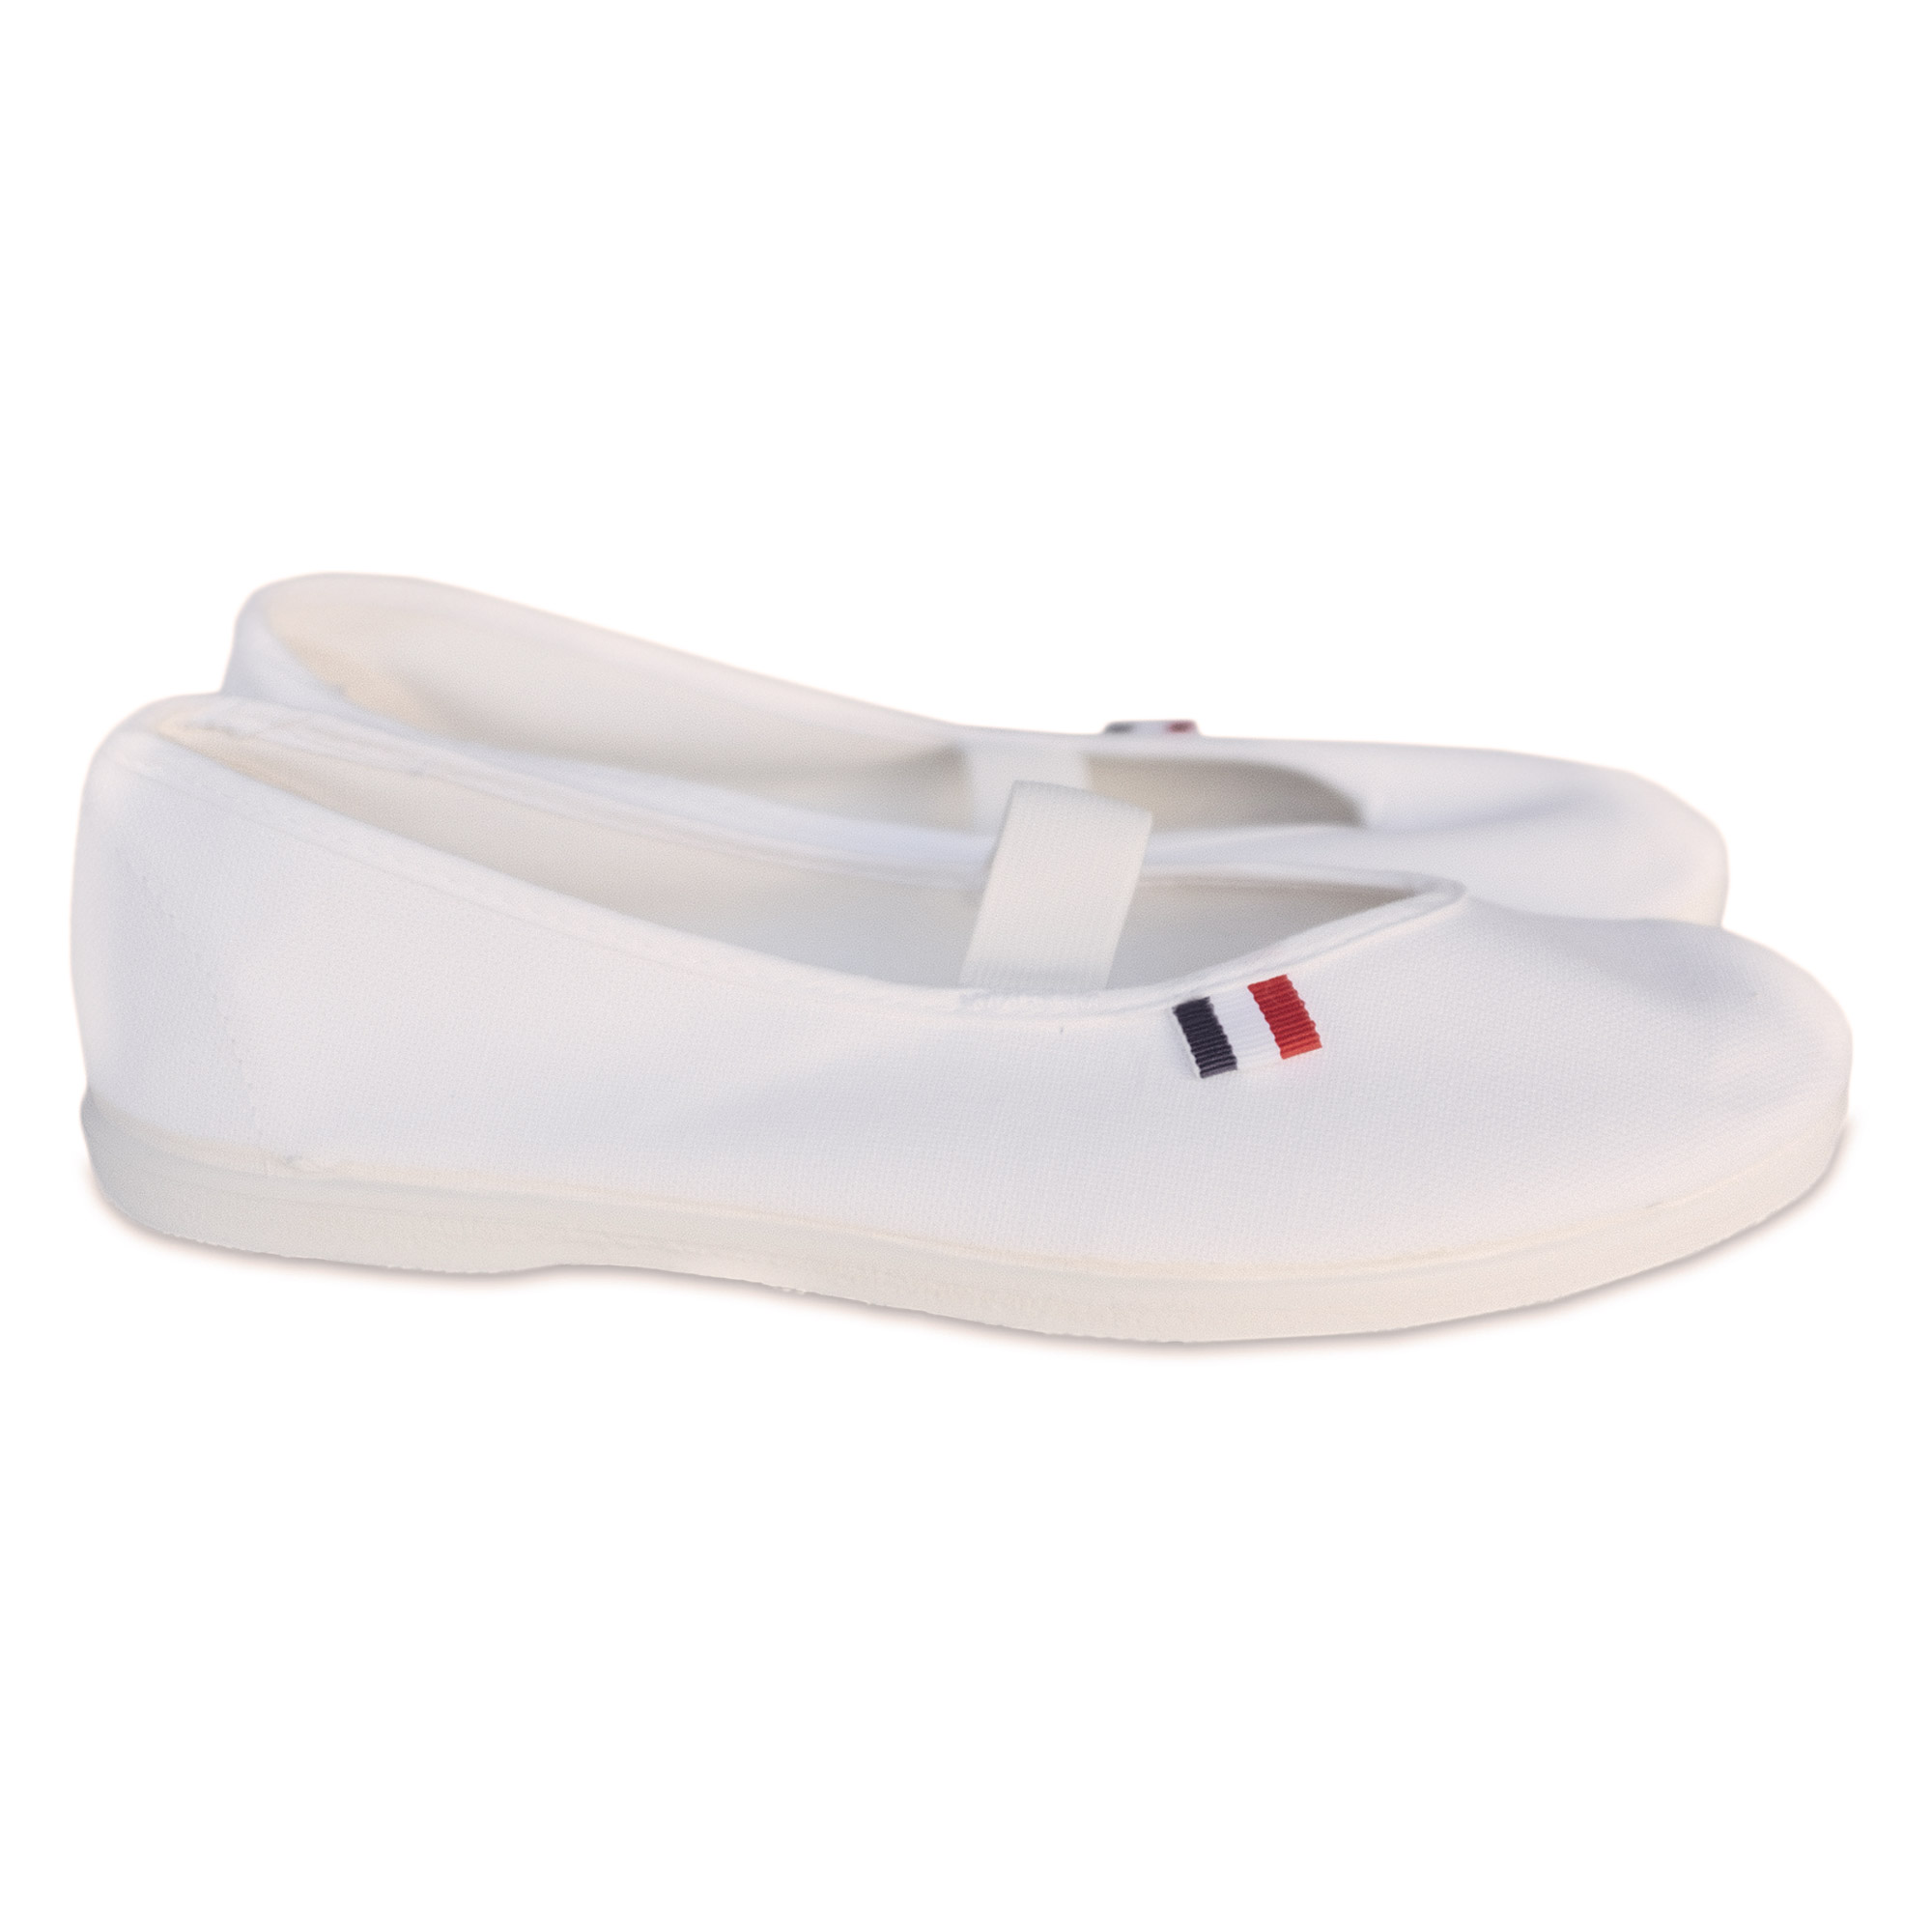 ea0b5c2263ca Krymská Sailor Shoes   Jarmilky Cvičky